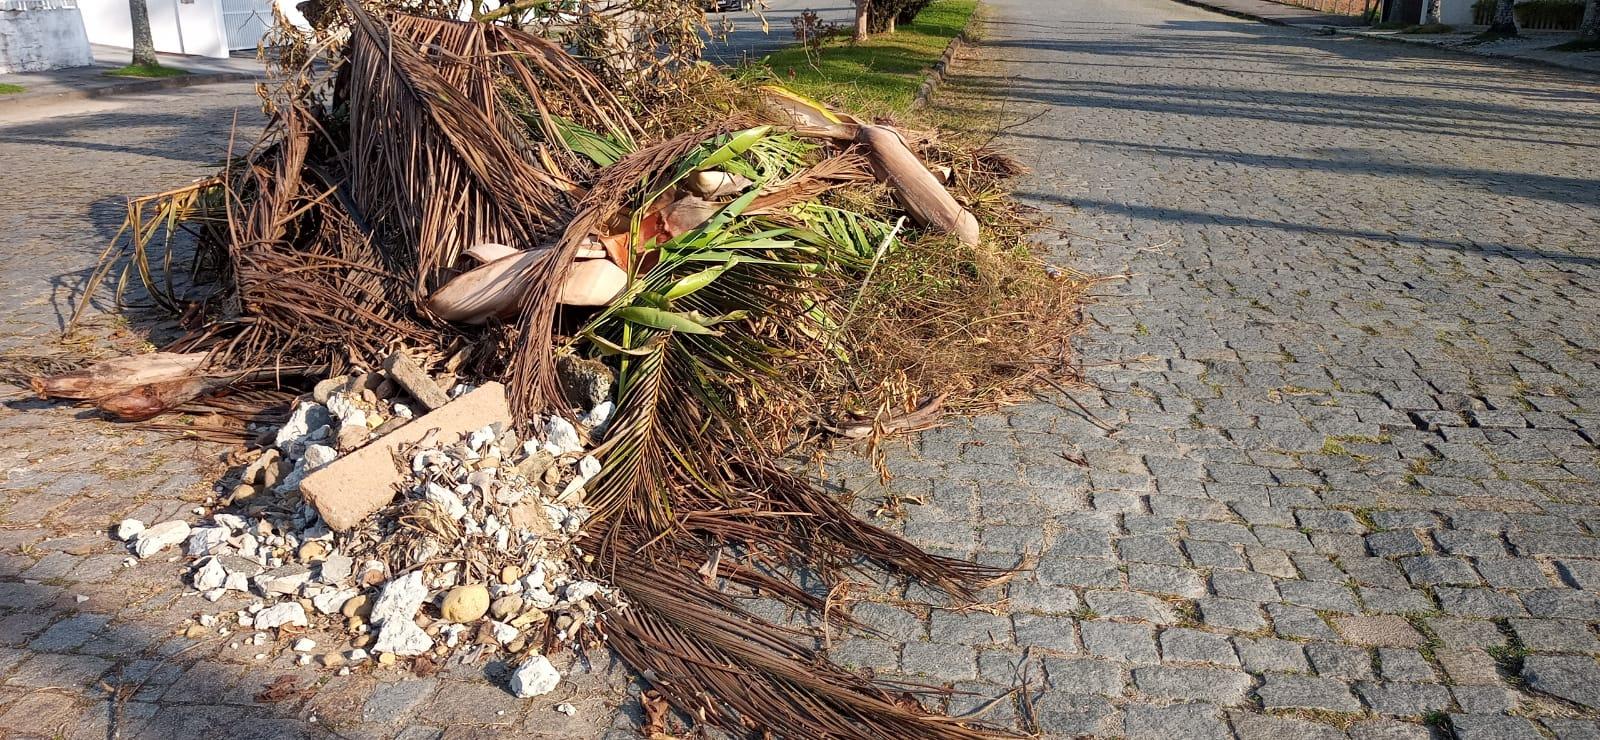 Prefeitura averigua descarte irregular de resíduos